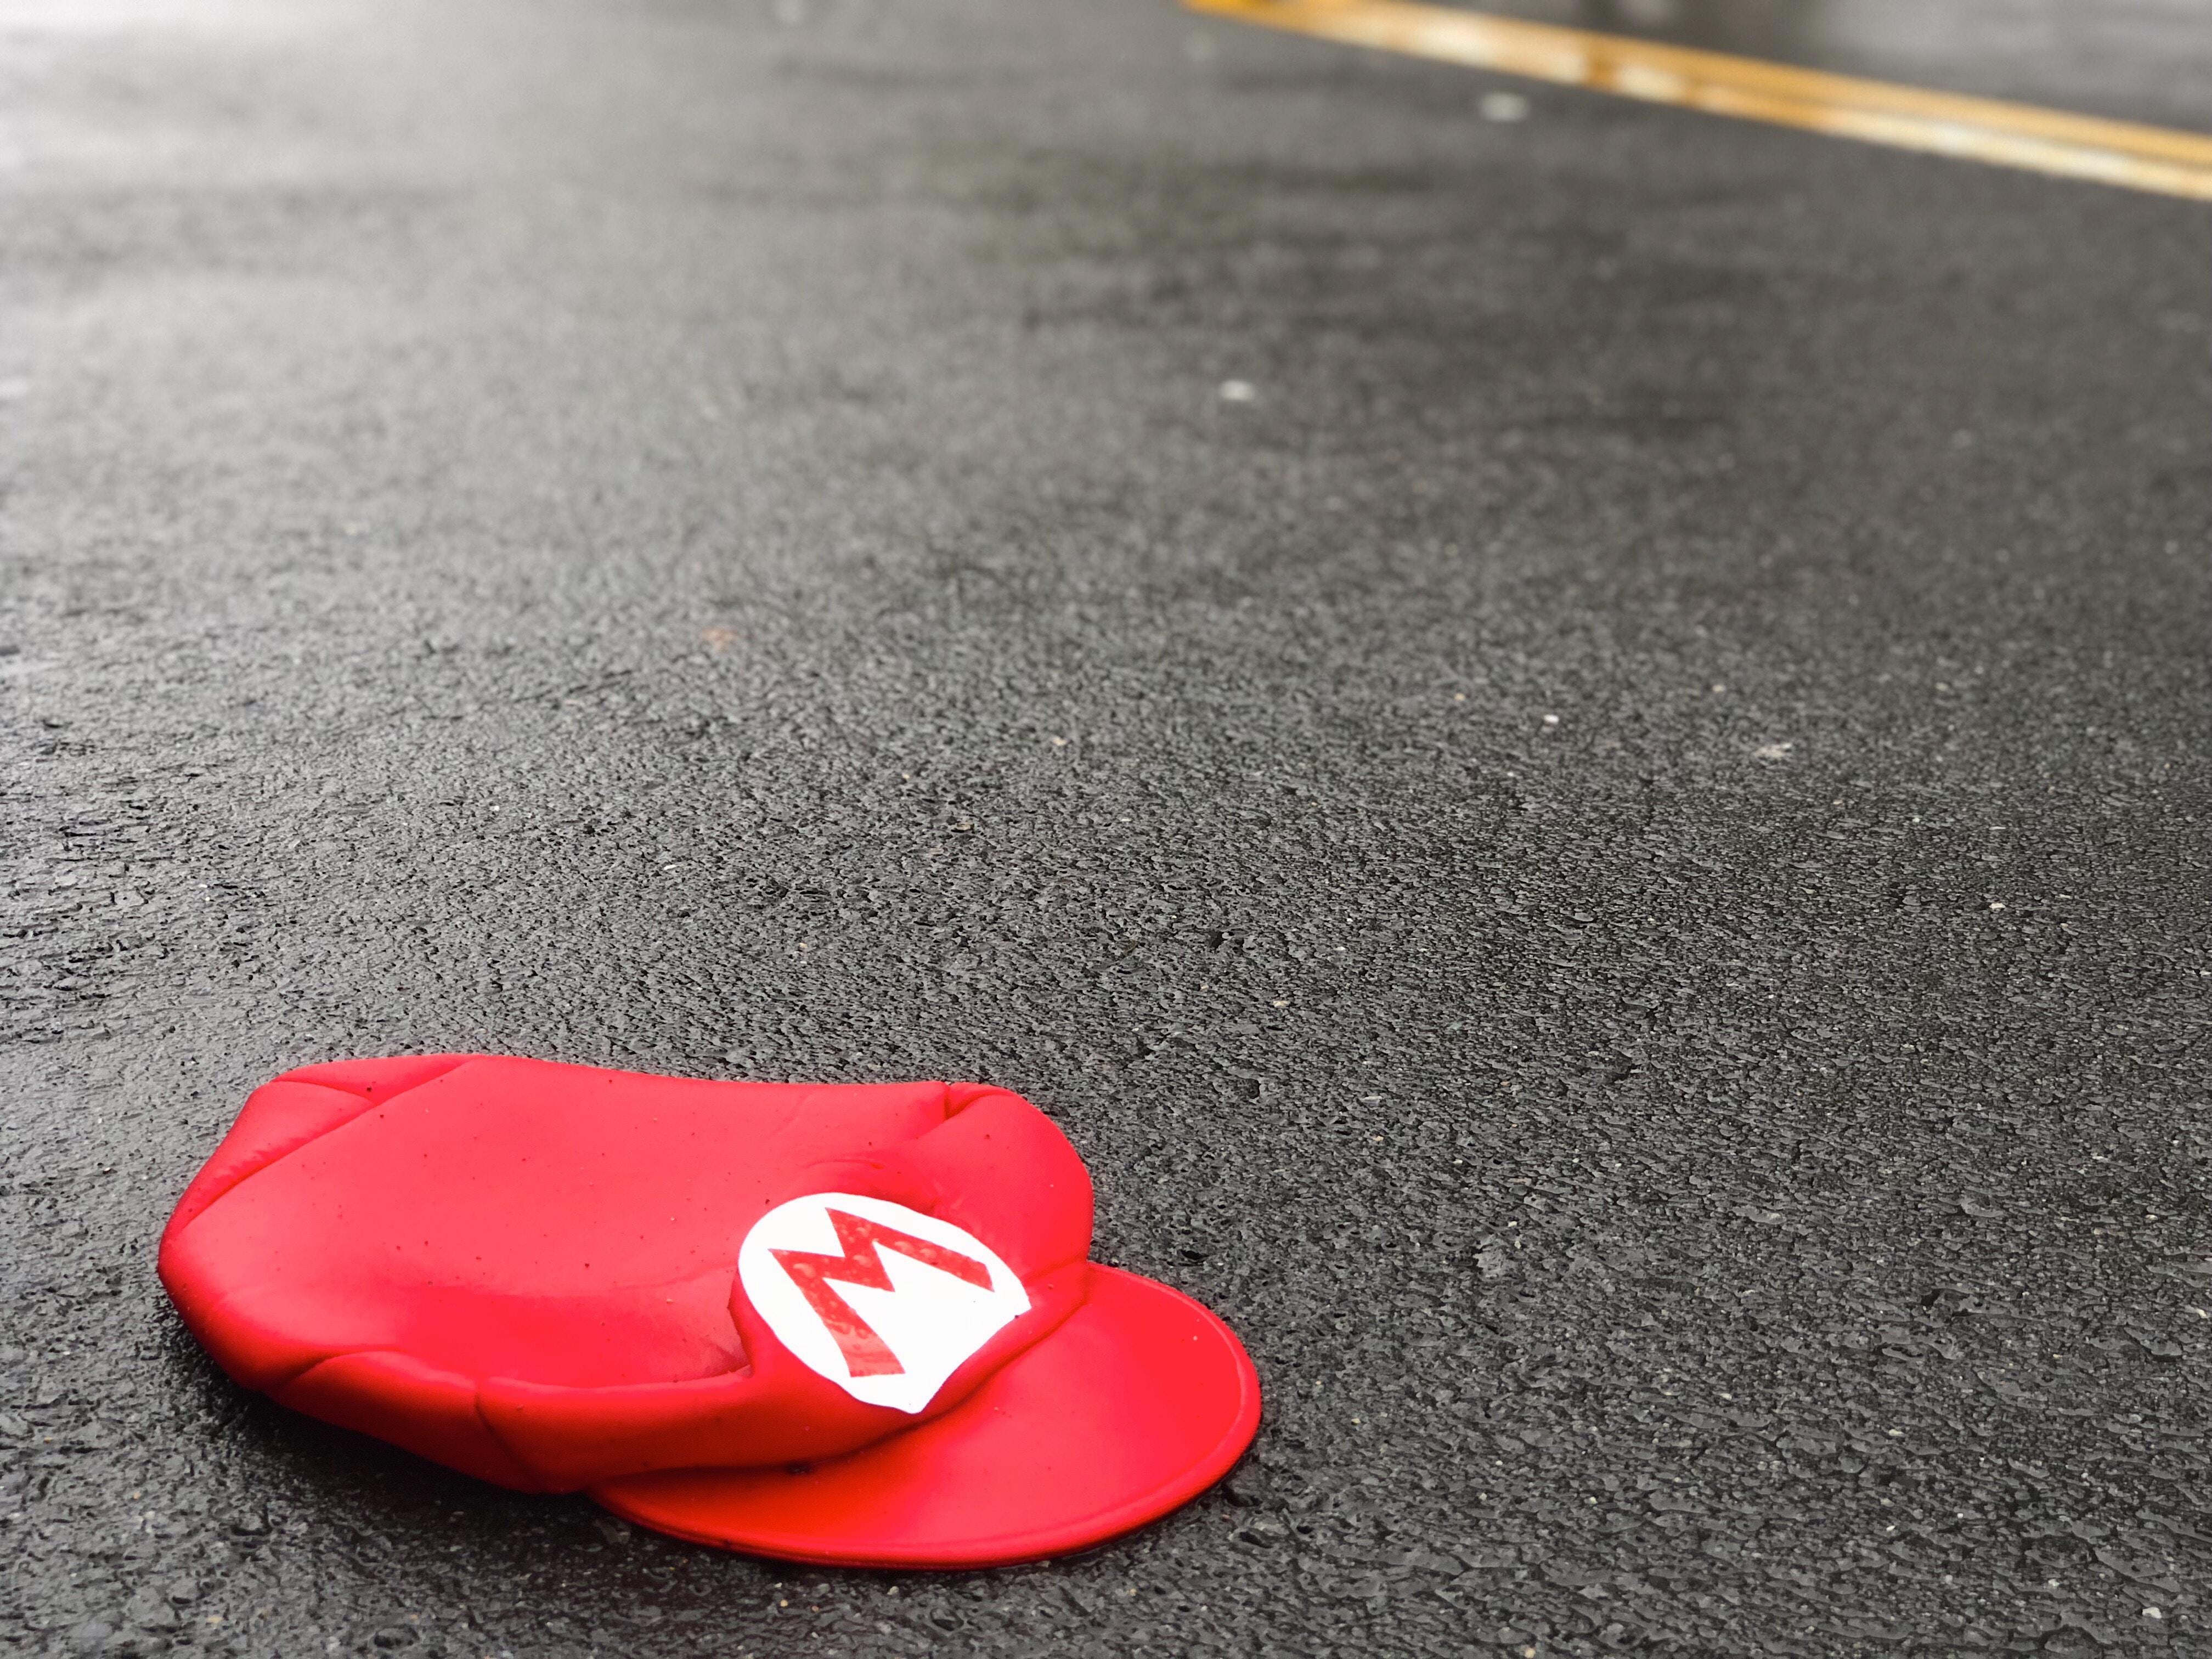 Mario hat on ground